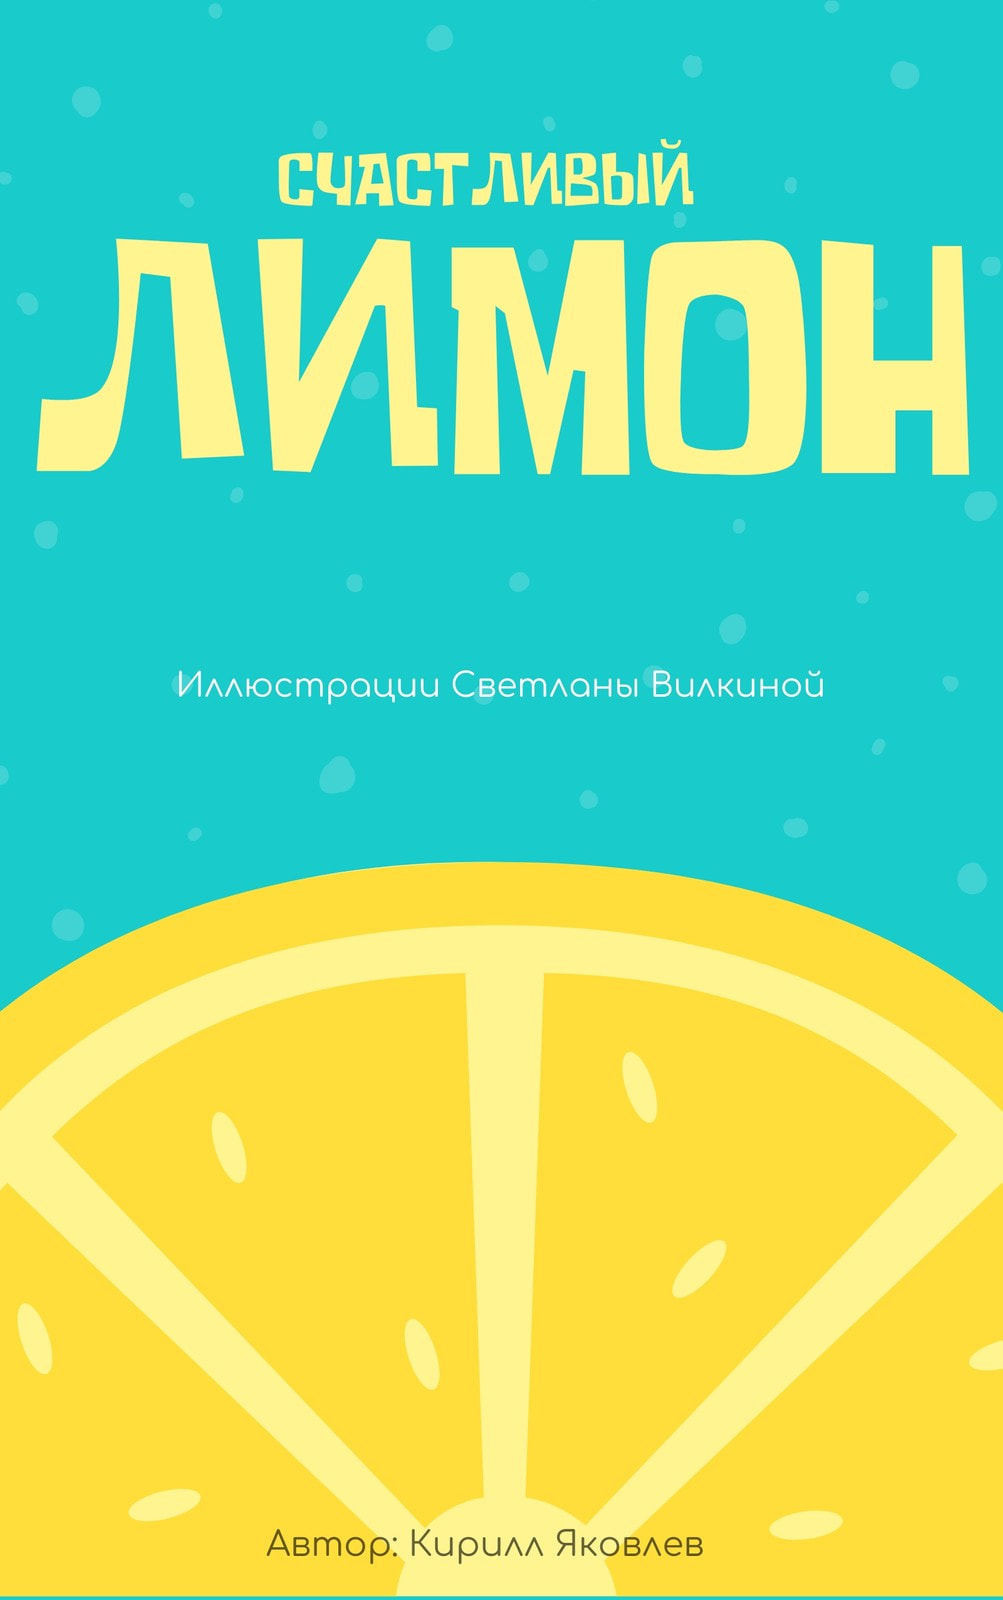 Желтый Лимон Дети Книга Обложка